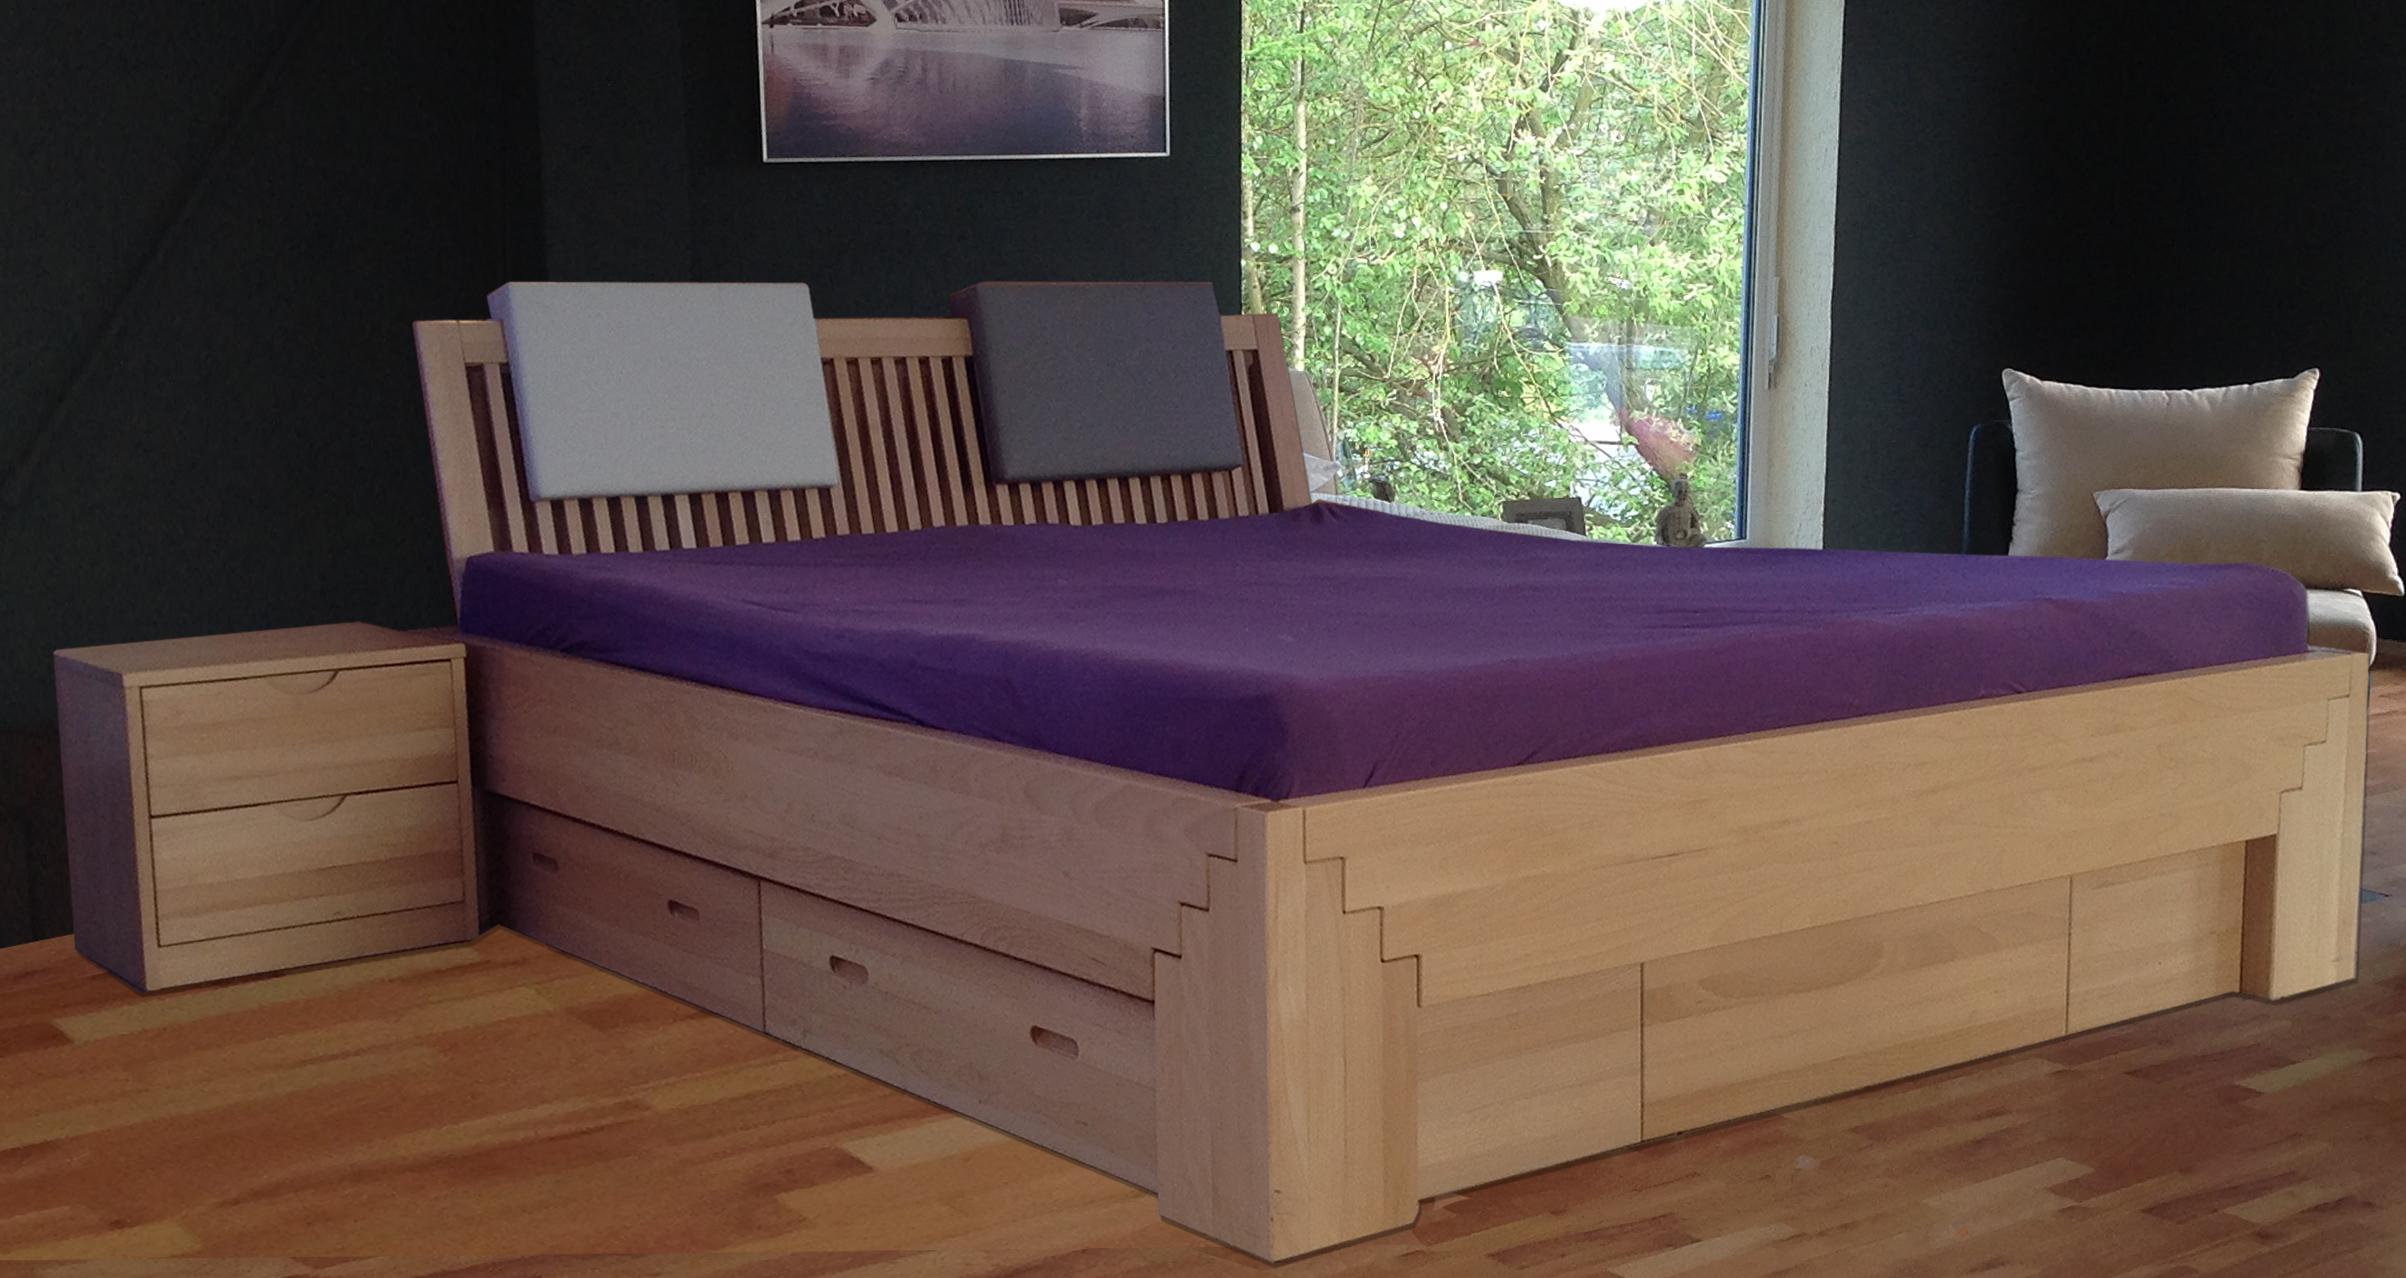 boxspringbett santa clara wasserbettmatratzen und gelmatratzen. Black Bedroom Furniture Sets. Home Design Ideas